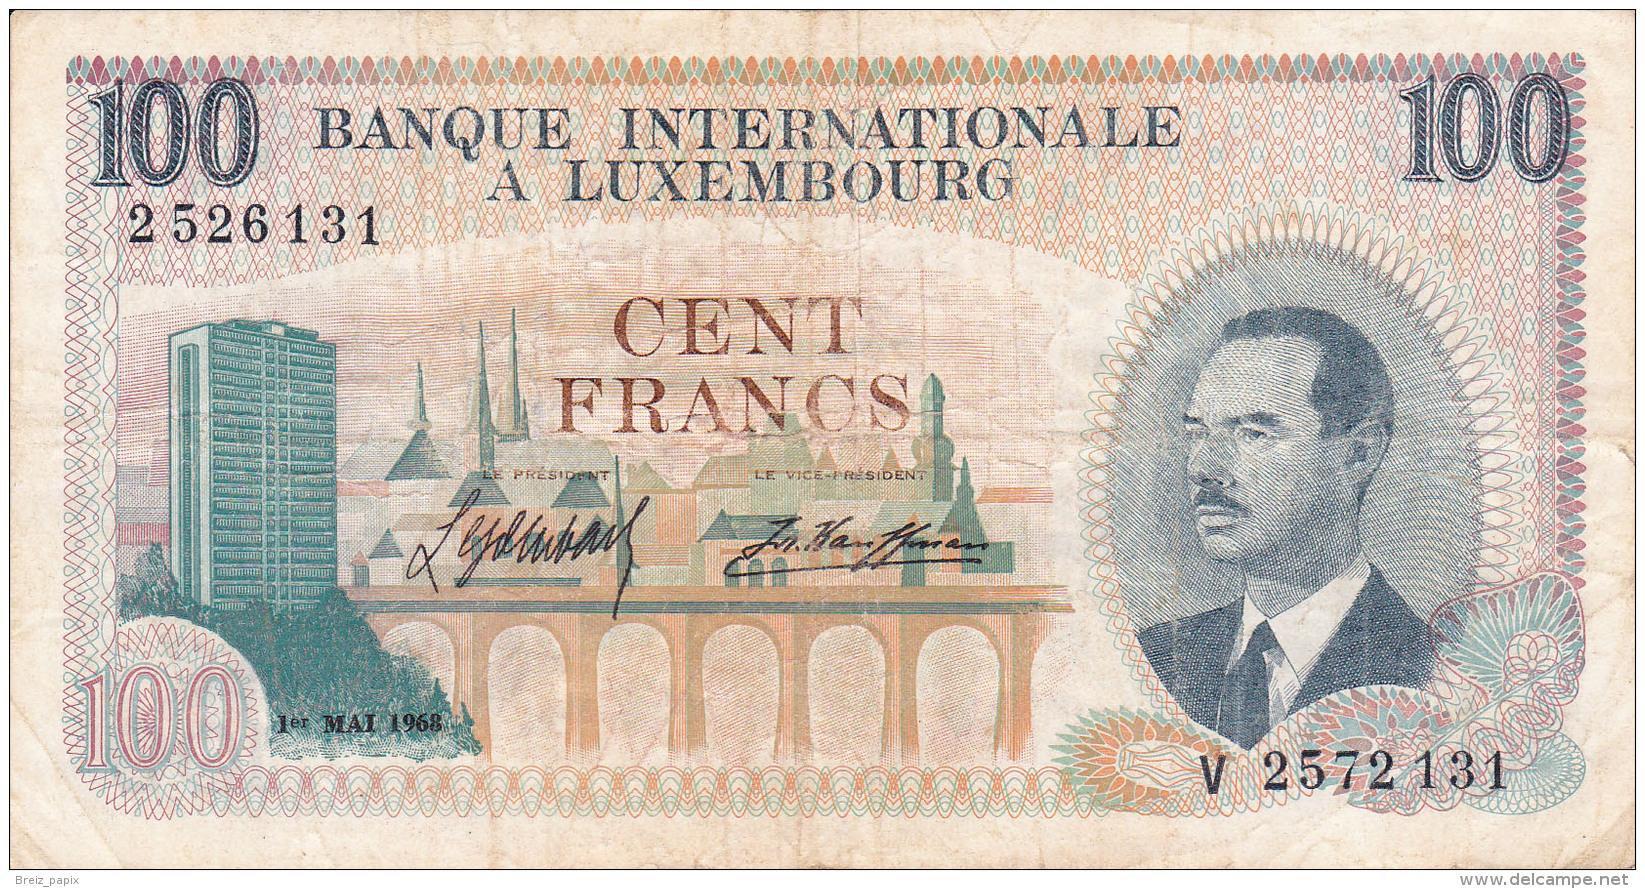 LUXEMBOURG - BILLET DE 100 FRANCS - 1968 - Luxembourg